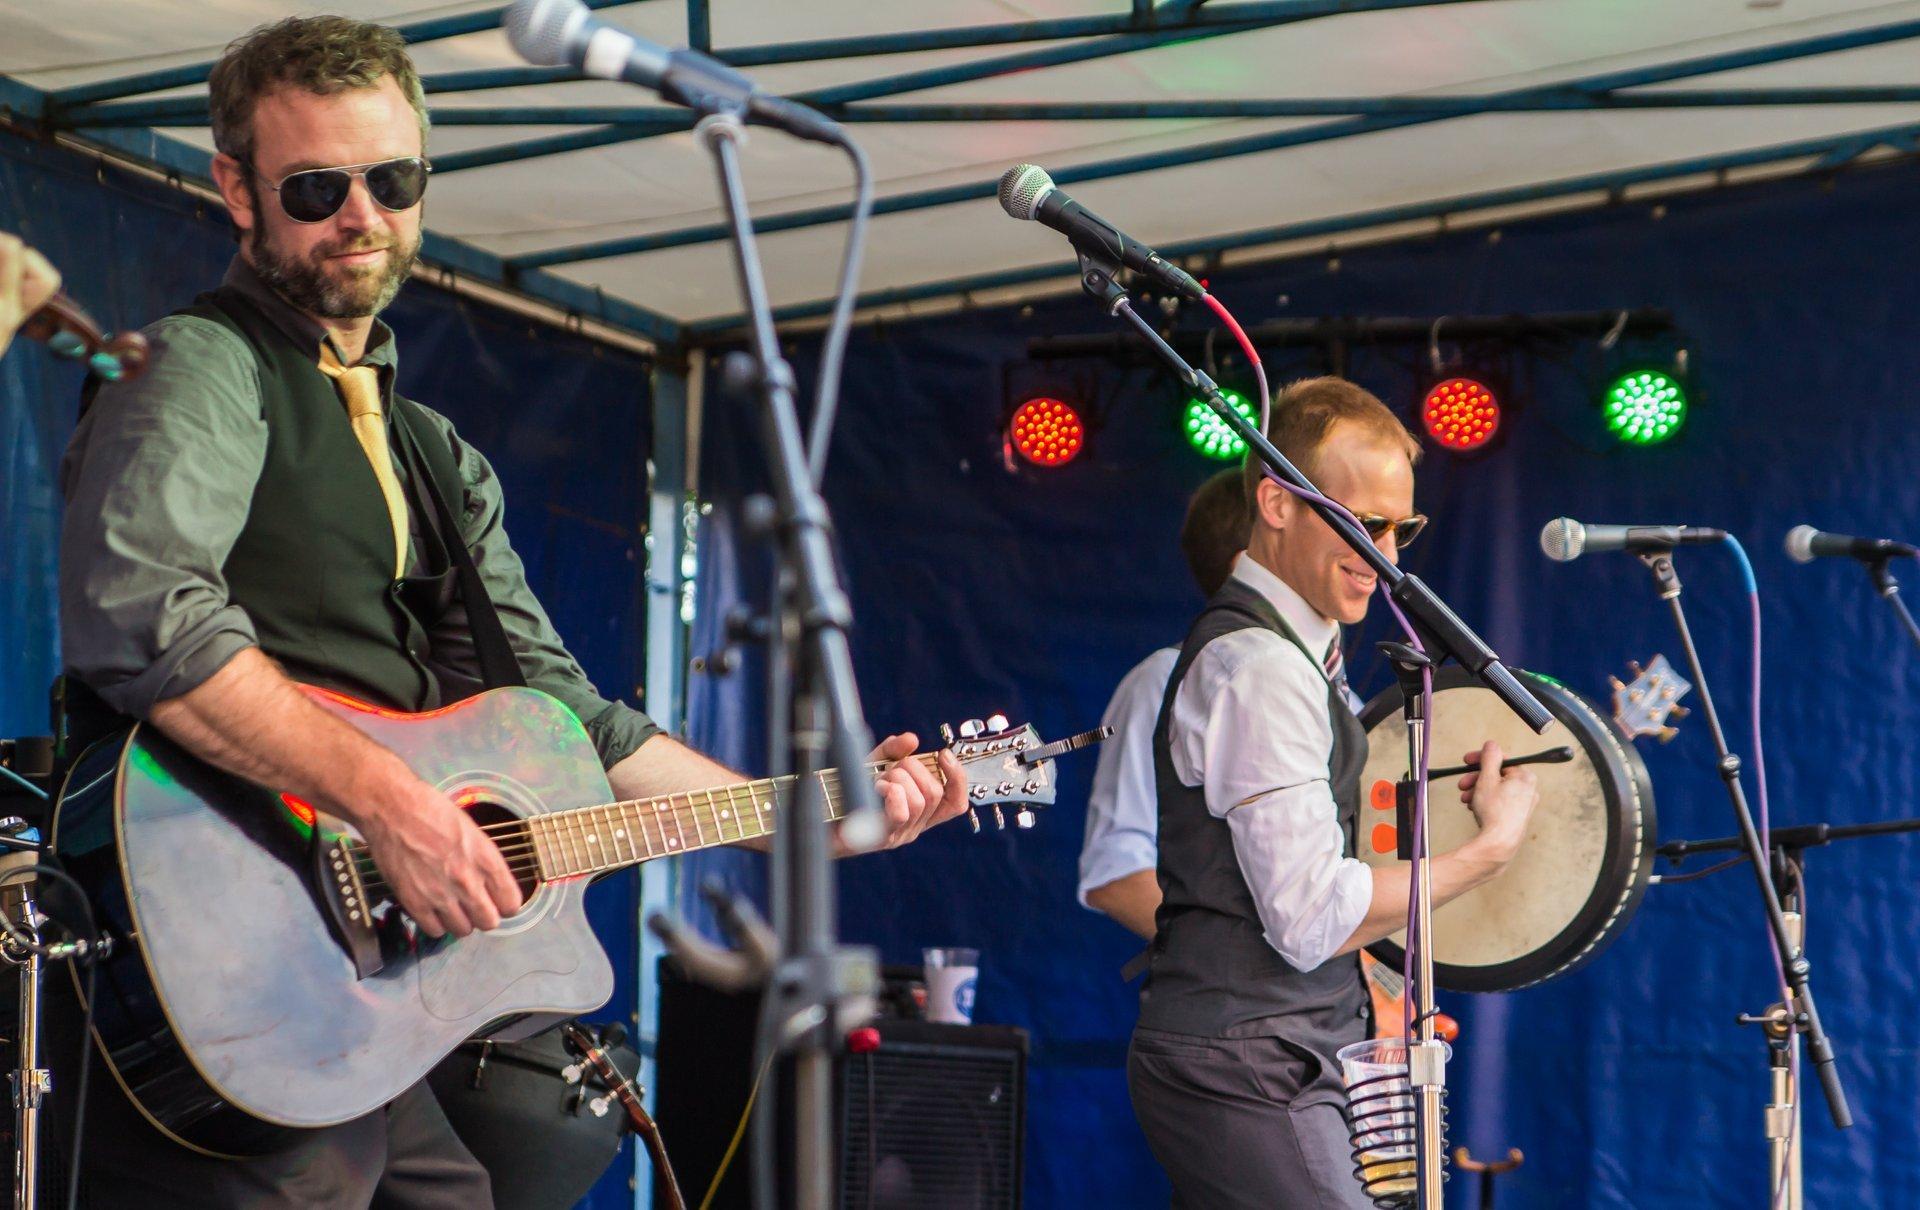 Corvallis Fall Festival in Oregon 2020 - Best Time